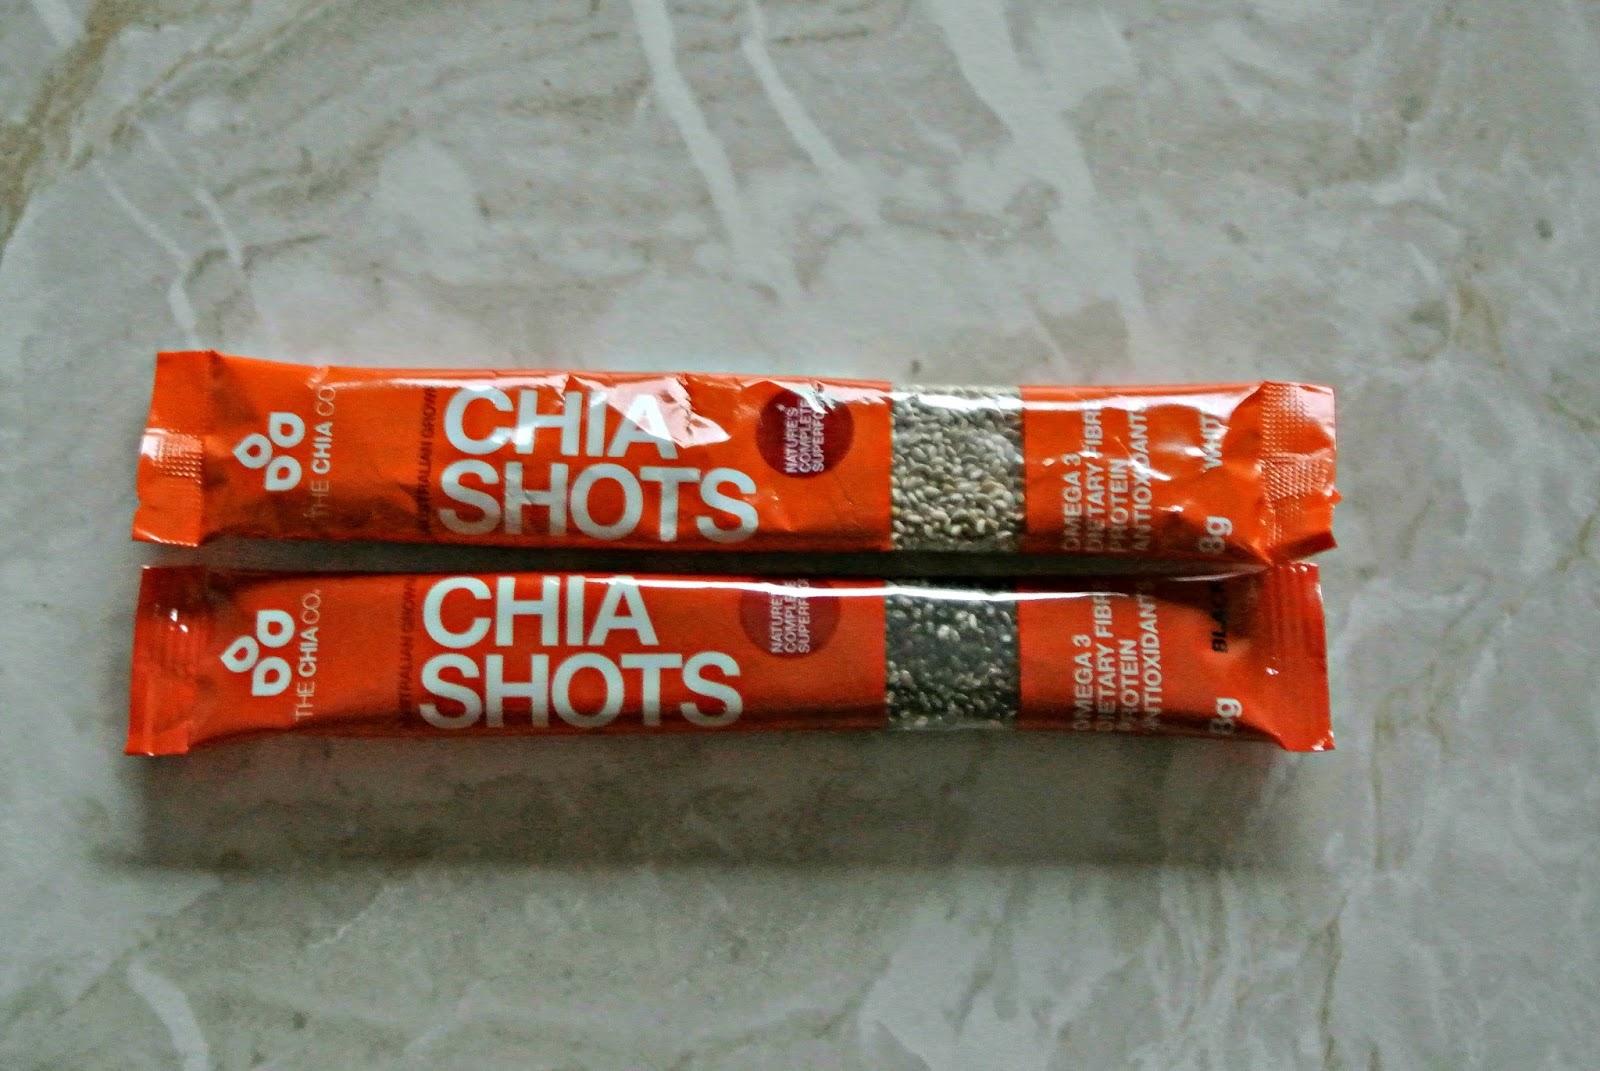 Chia Shots Degustabox